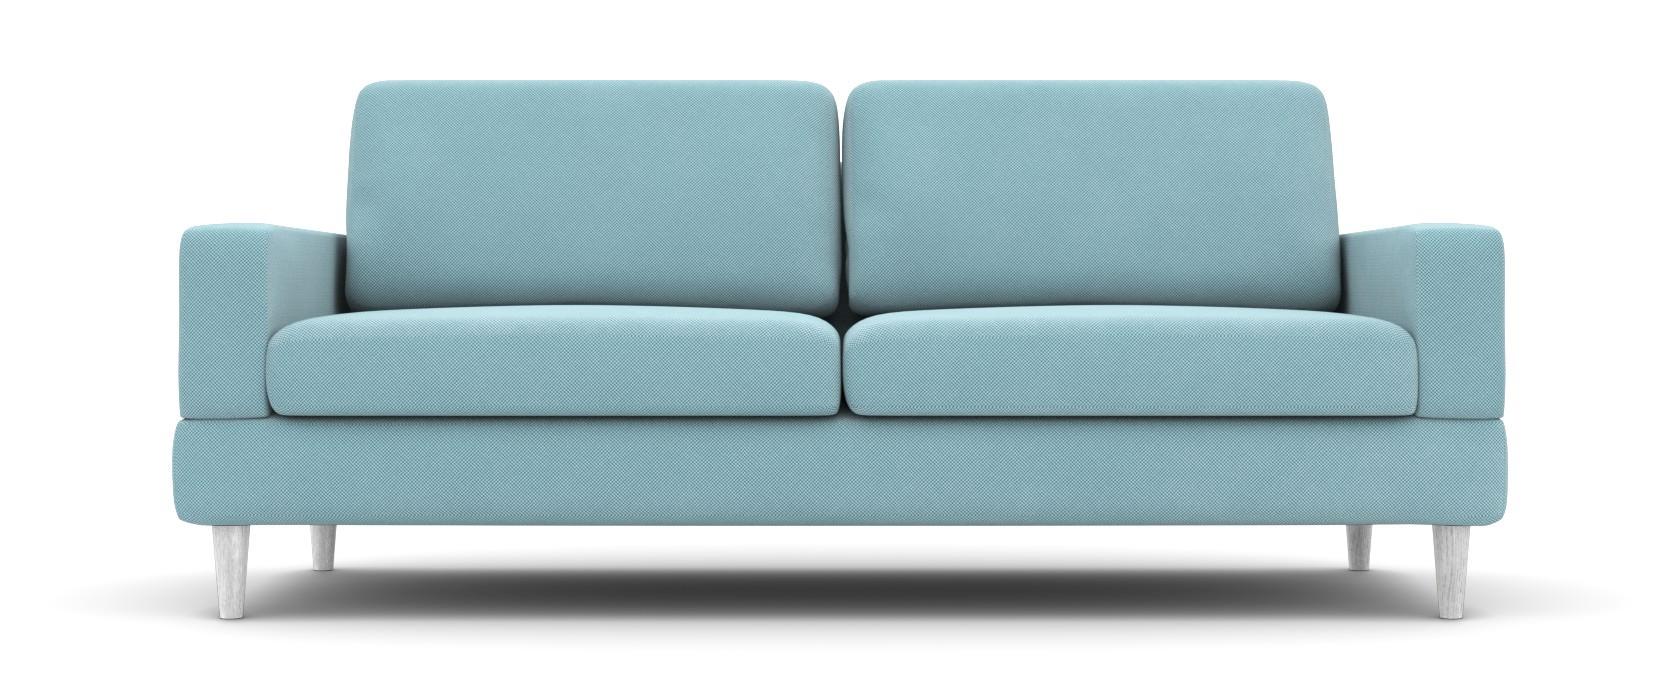 Тримісний диван Bruno - Pufetto